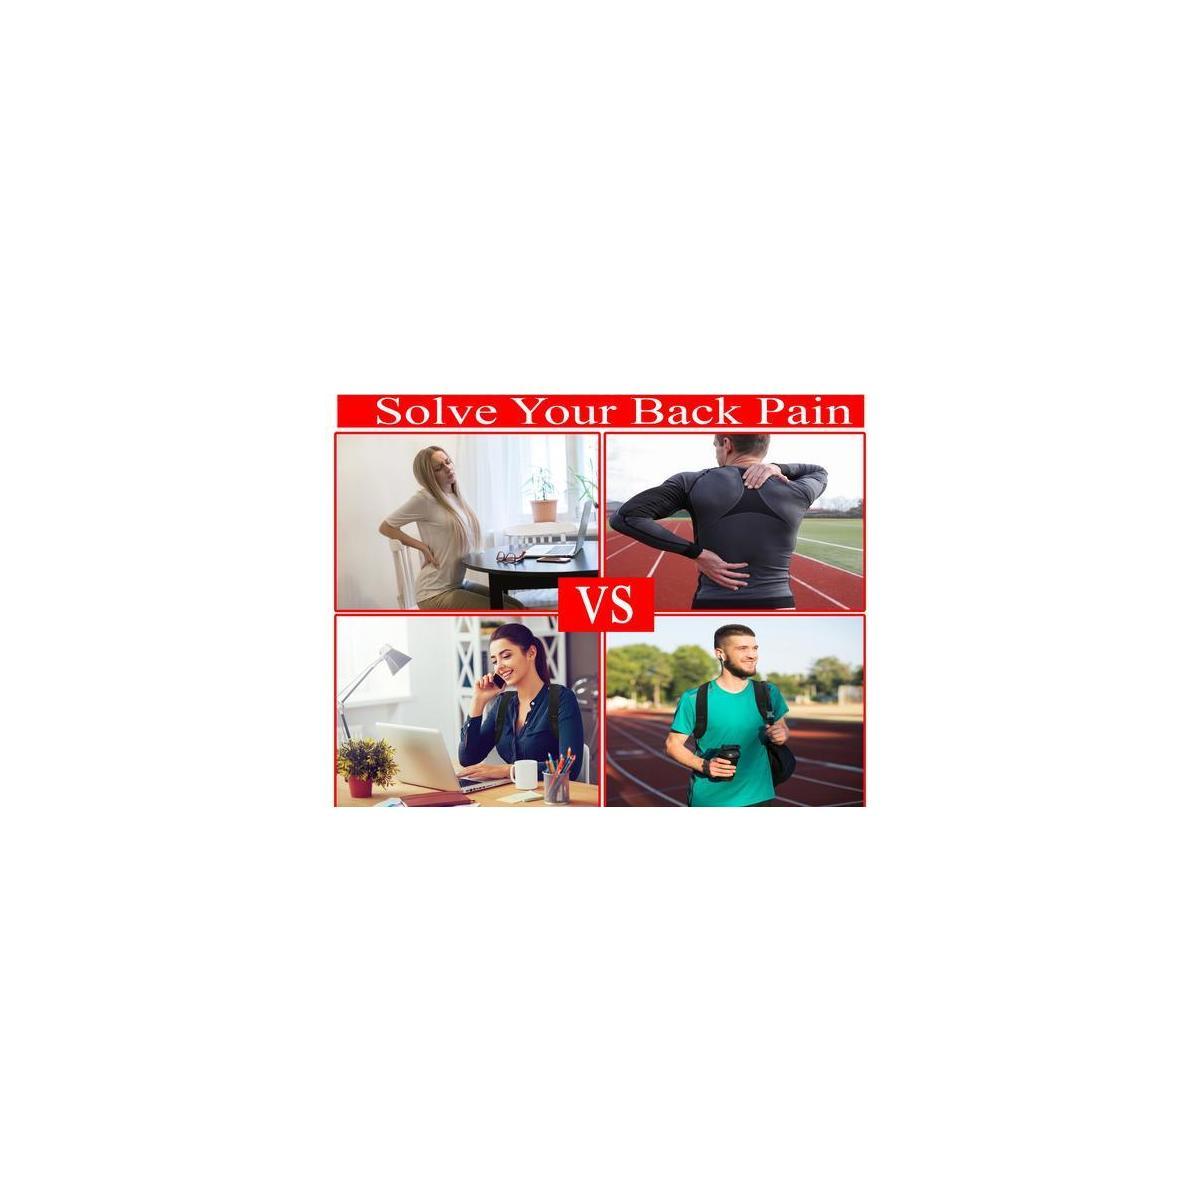 Posture Corrector for Women and Men–Free Wrist Wrap-Shoulder and Neck Pain Relief-Adjustable Comfortable Posture Back Brace -Orthopedic Upper Back-Clavicle Support Brace Posture Belt Strap